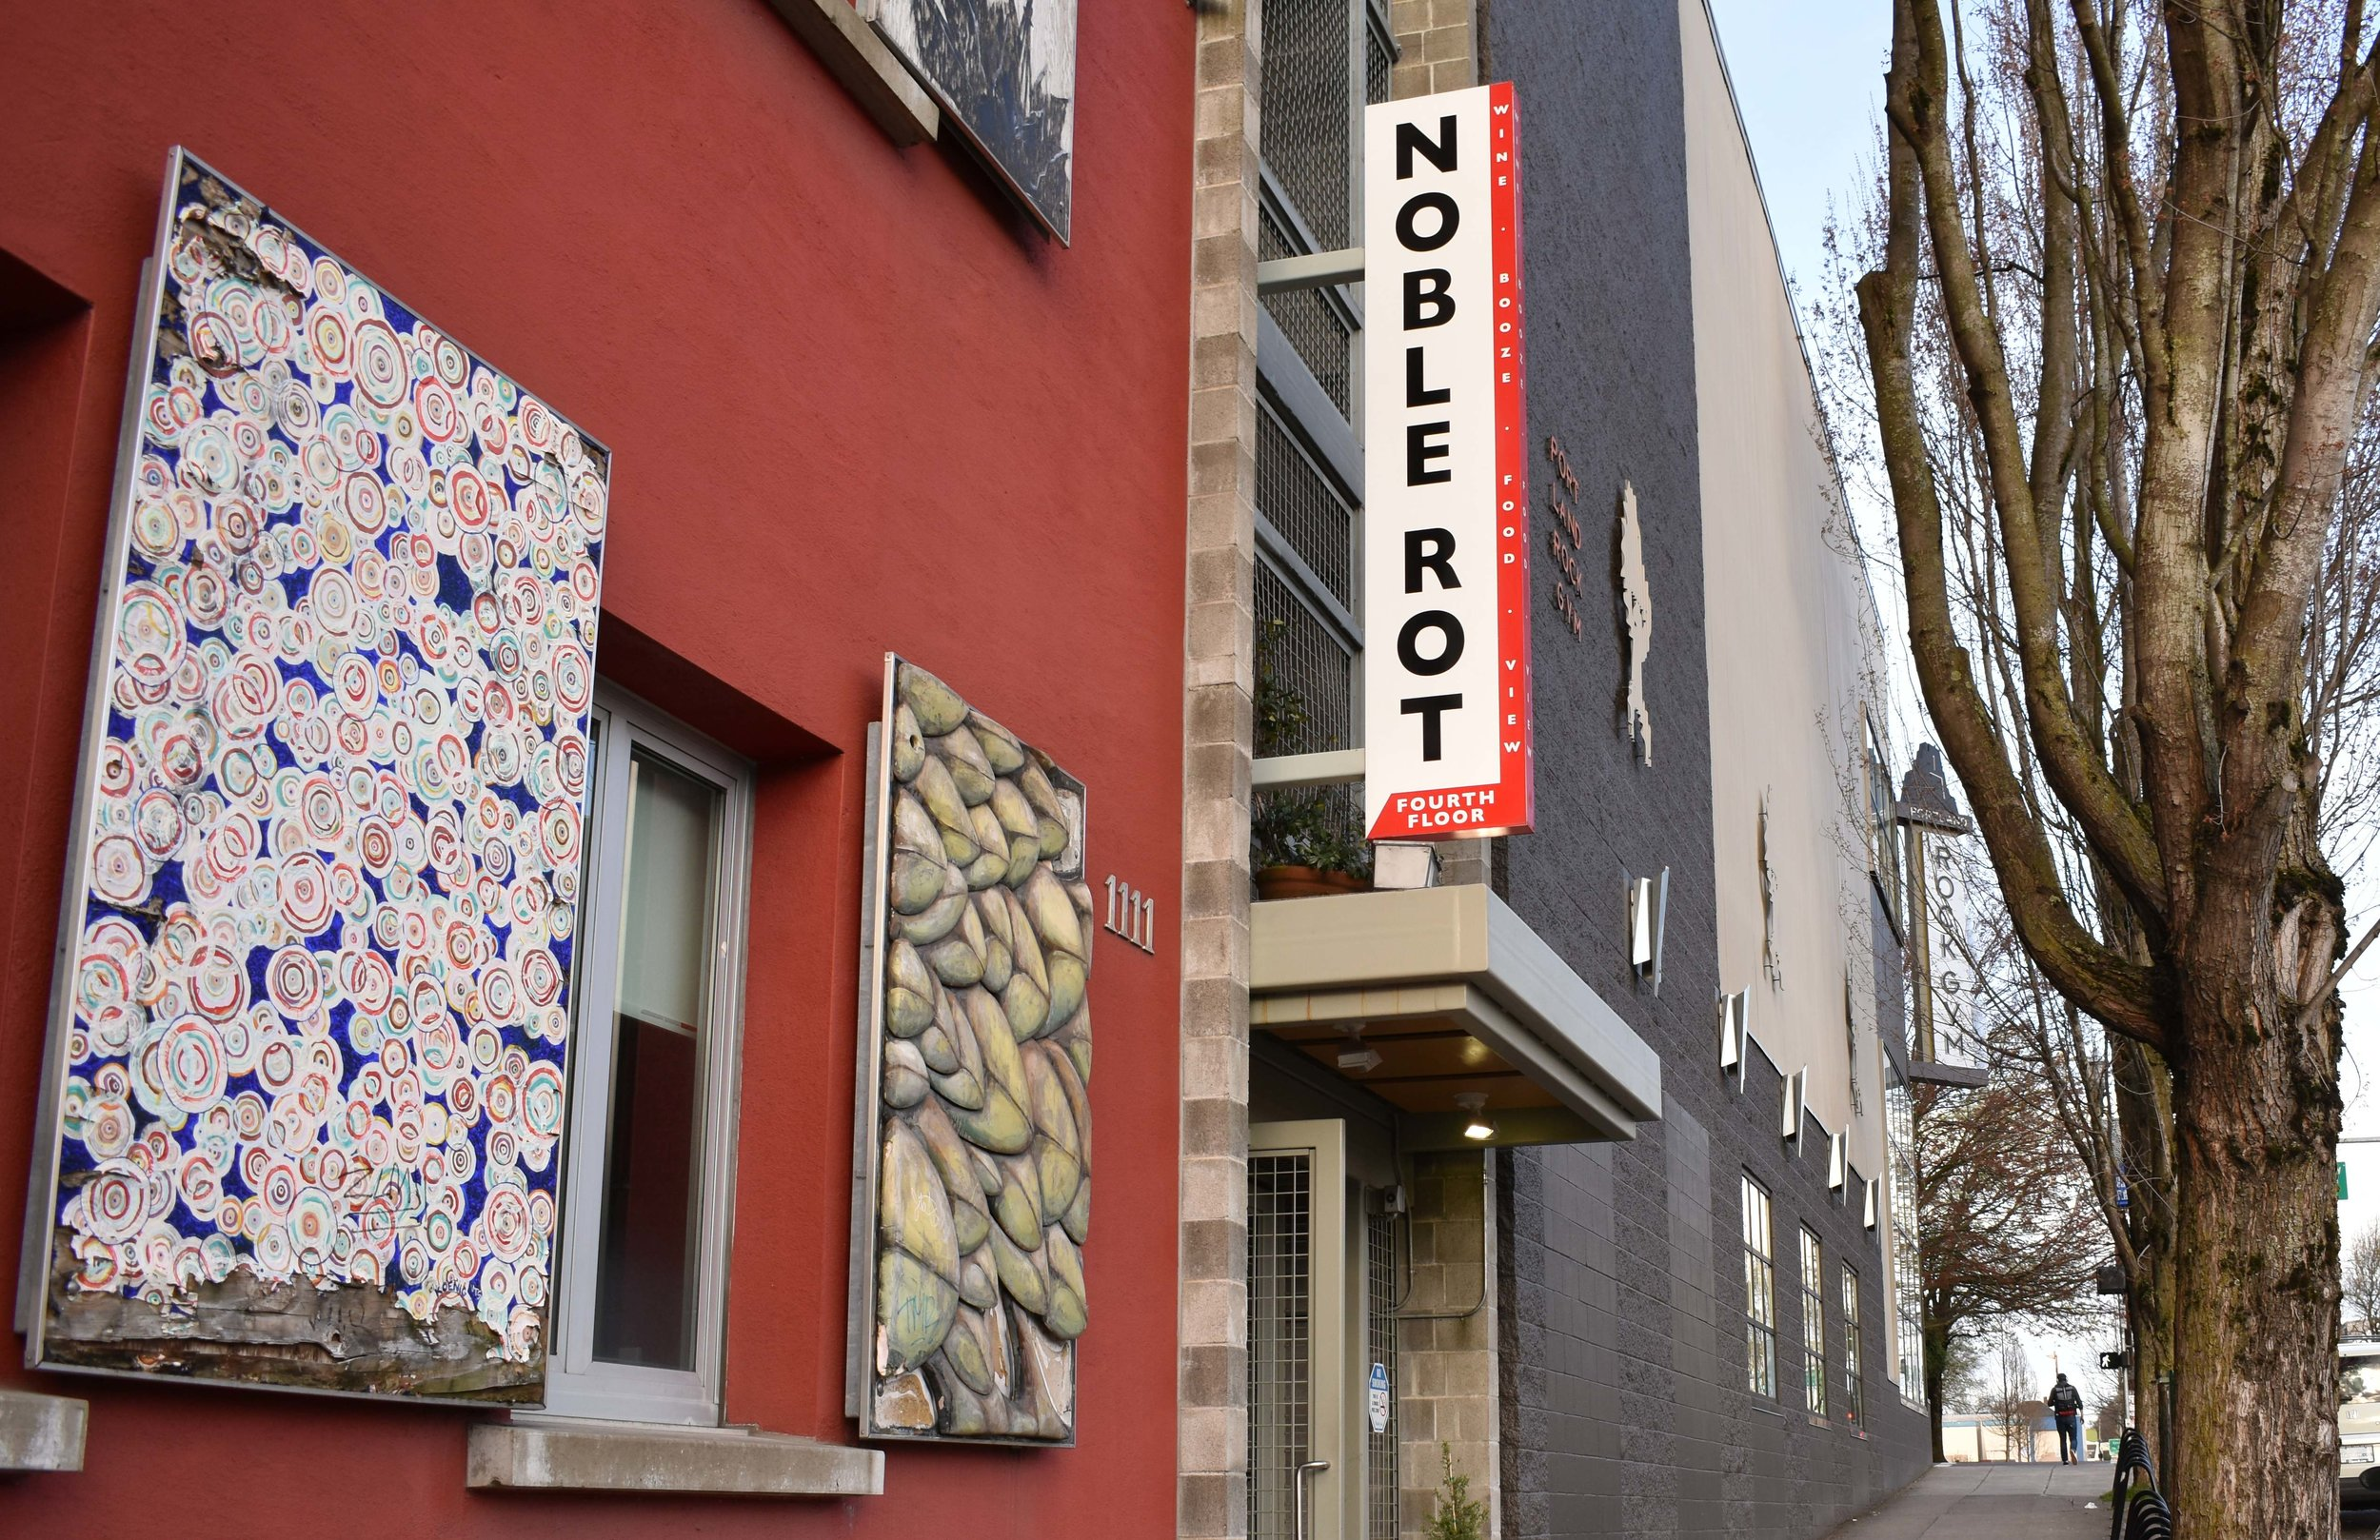 Noble Rot - 1111 E Burnside St,Portland, OR 97214Sun-Th12-9pm Friday & Saturday 12-10pm+1503-233-1999www.NobleRotPDX.com